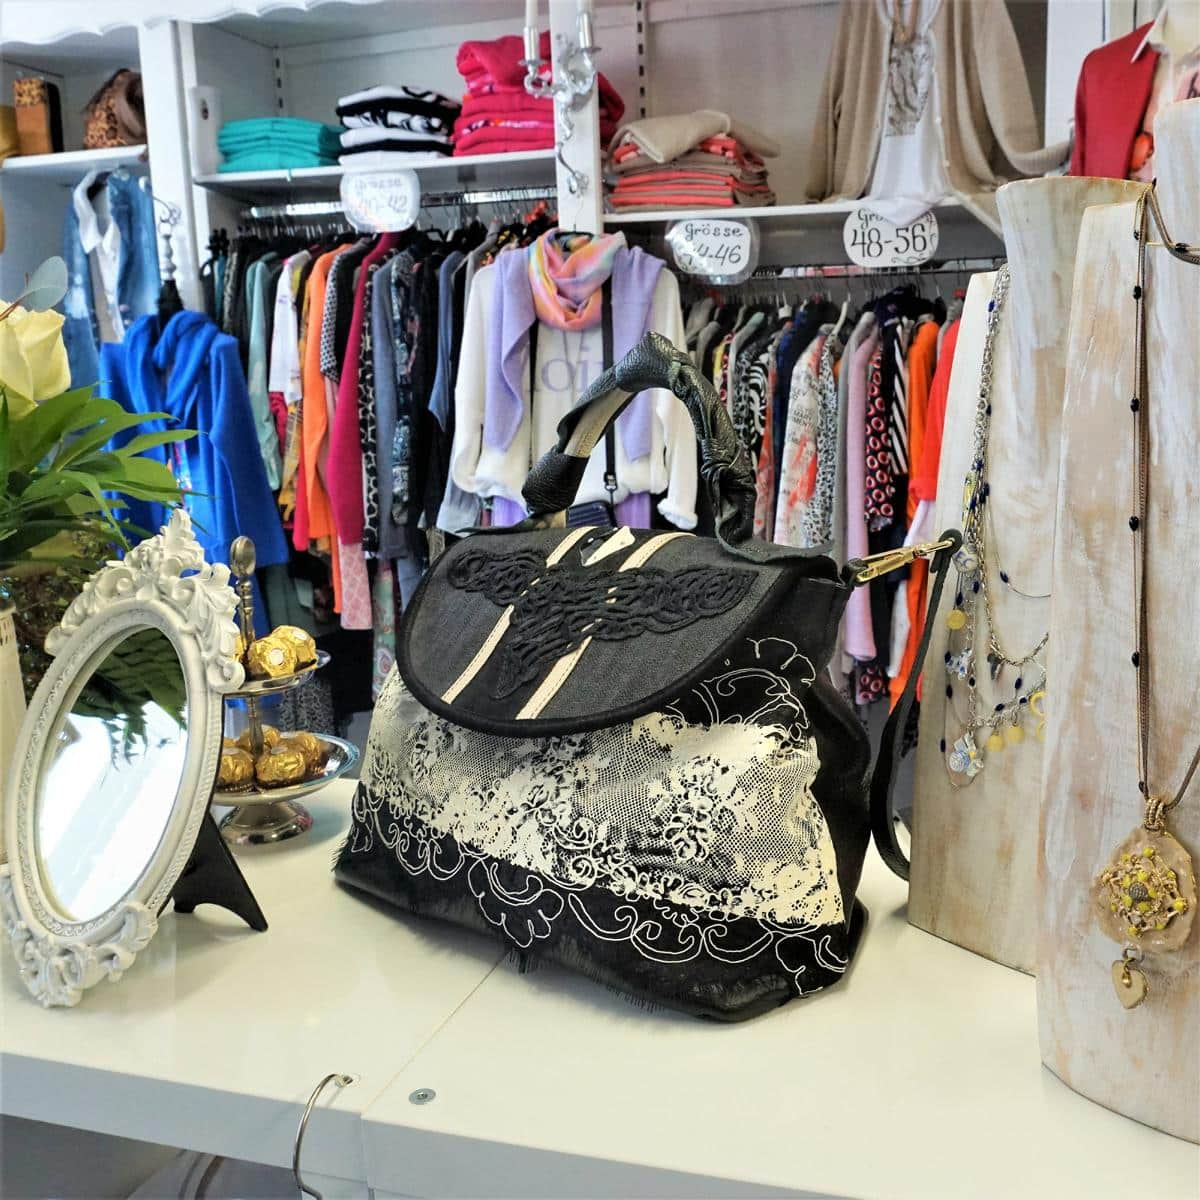 style hannover picco bello mode 4 - Picco Bello Mode – bunter Chic in allen Größen